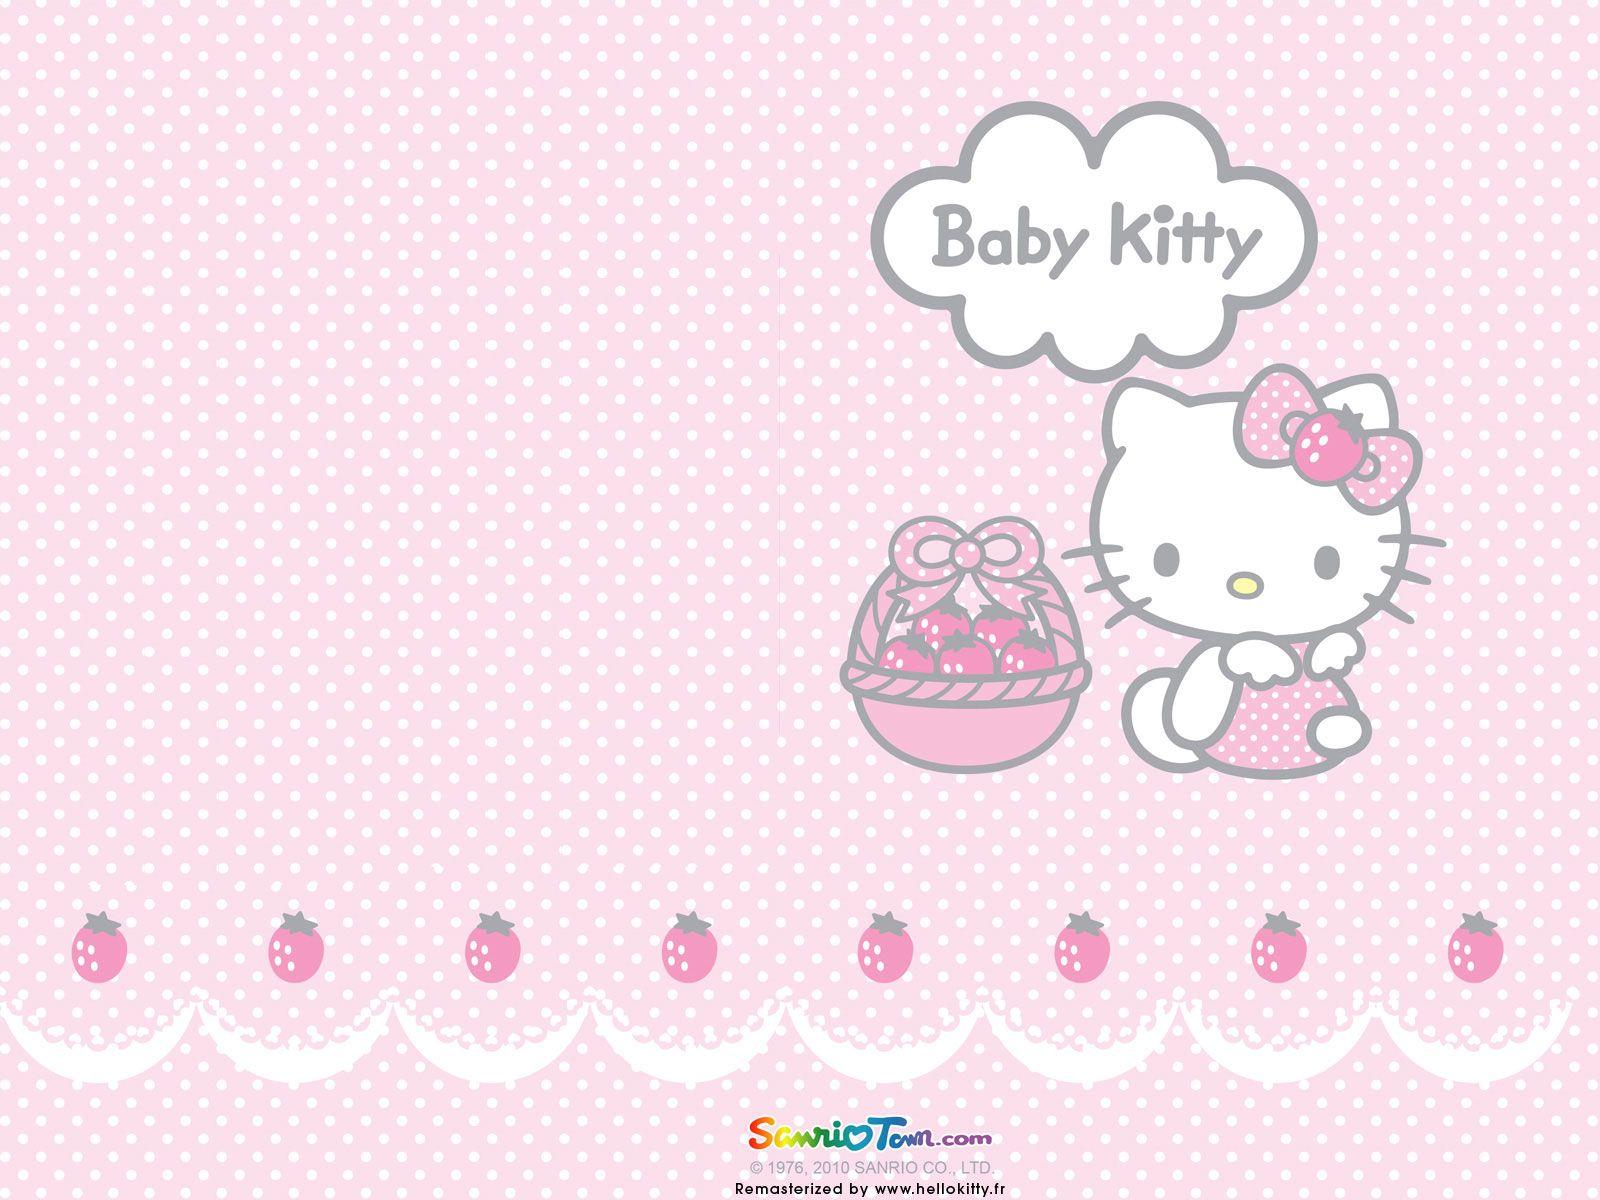 O Kitty Hdo Kitty Wallpaper Hd Wallpaper High Definition Wallpapers